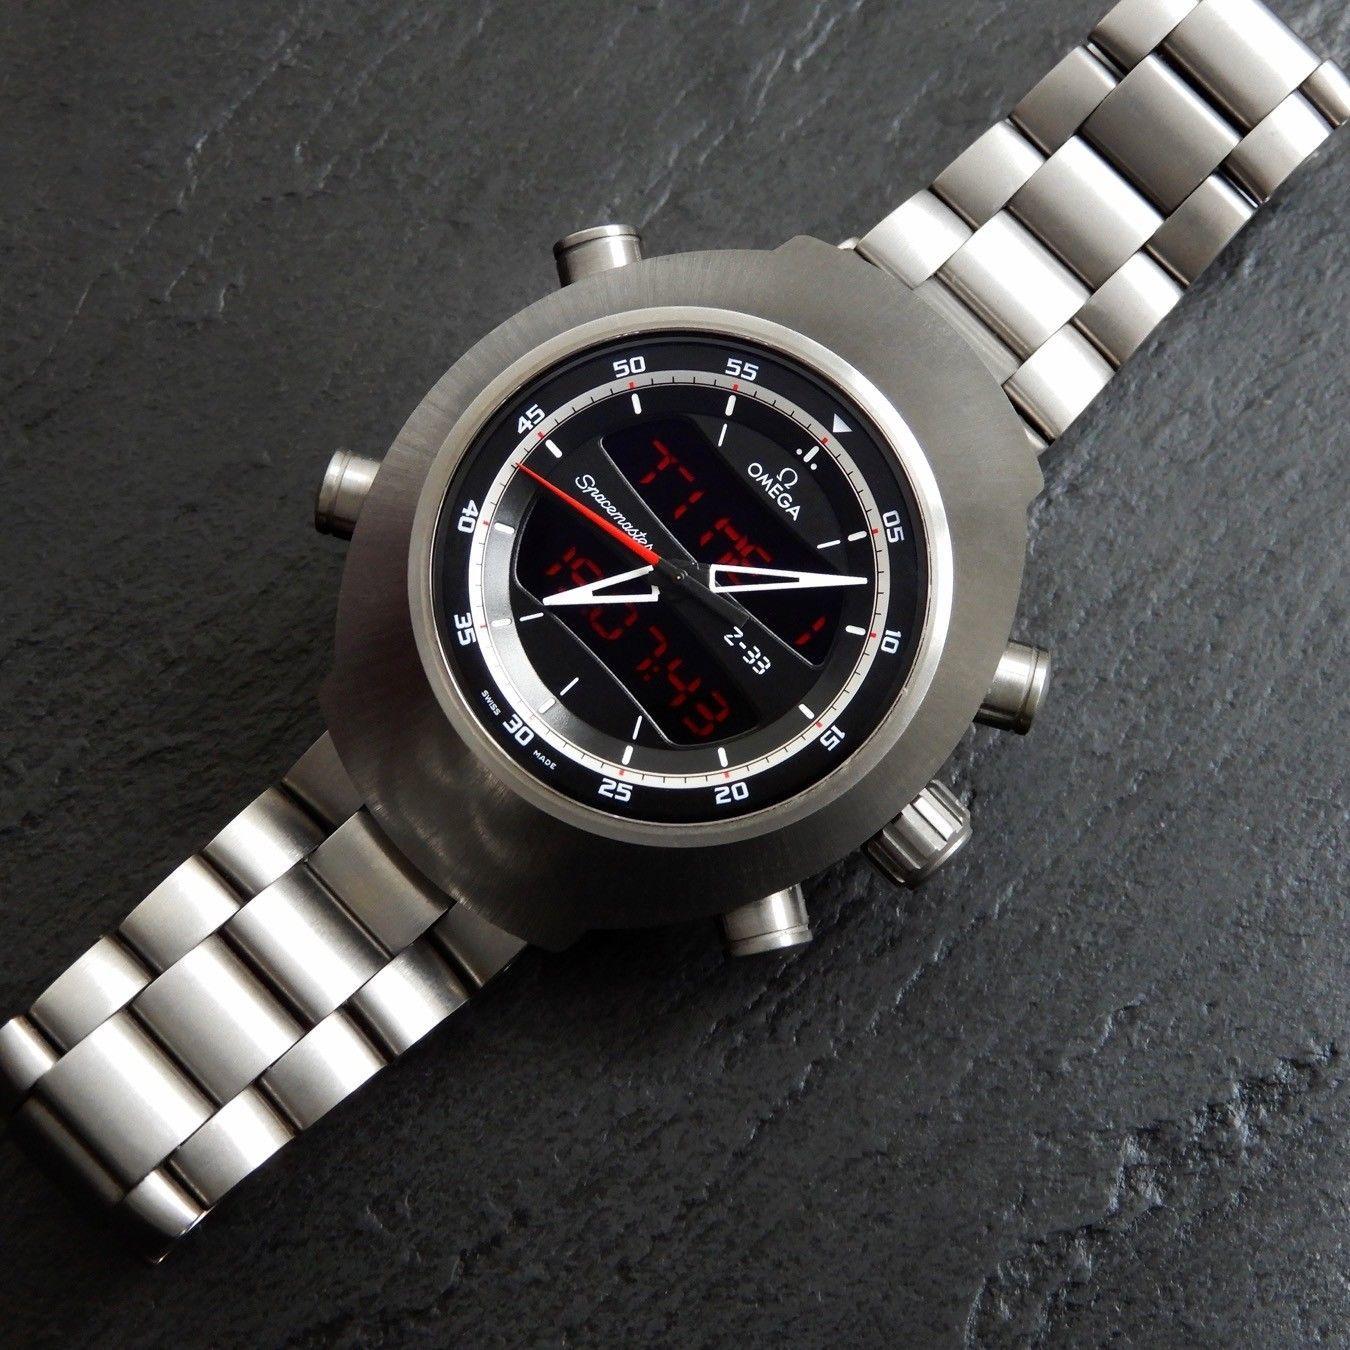 Adding to the timepiece's allure is its grade 5 titanium